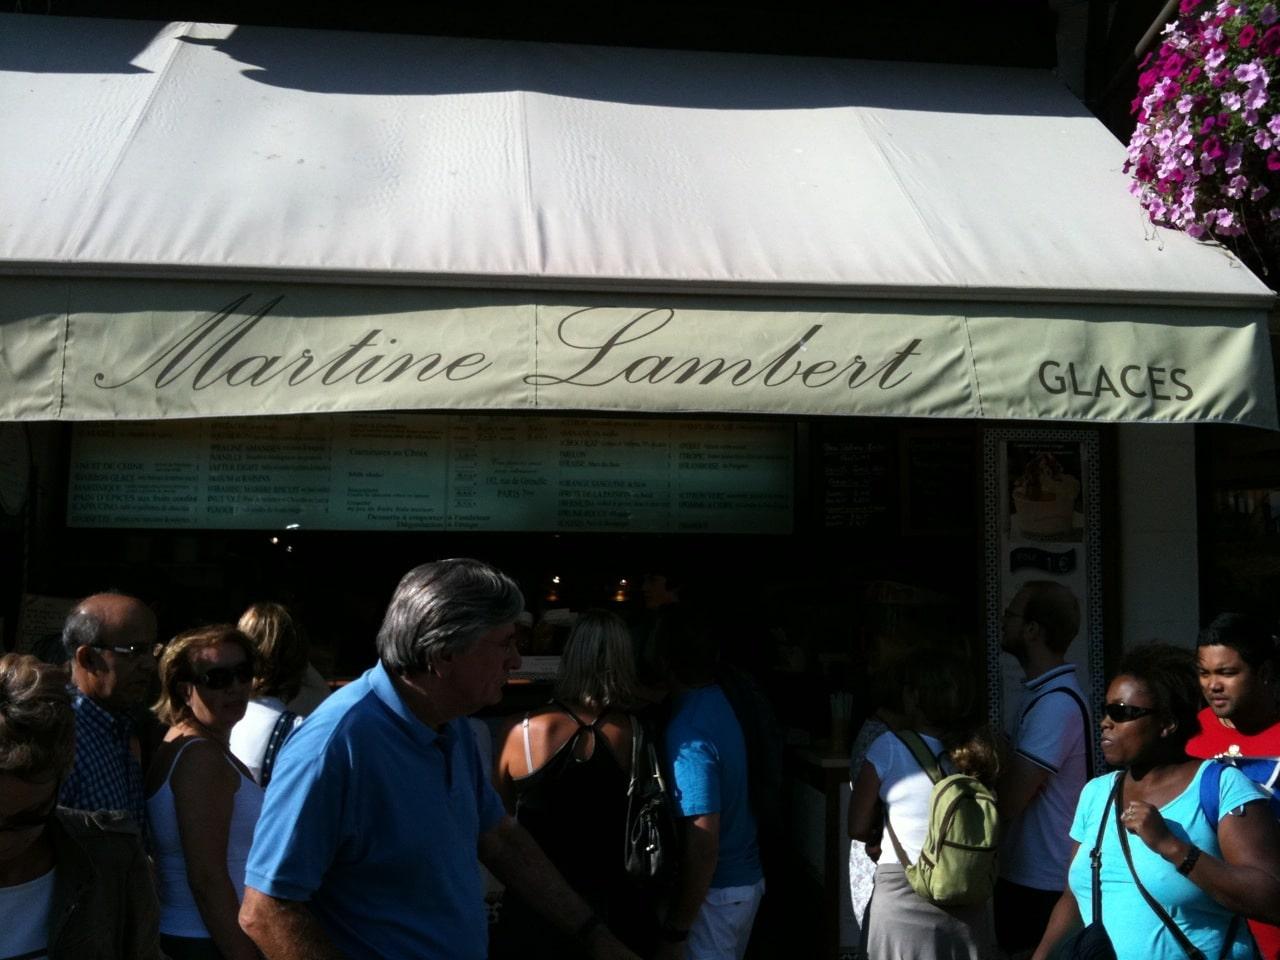 Deauville – Martine Lambert, un glacier de renom